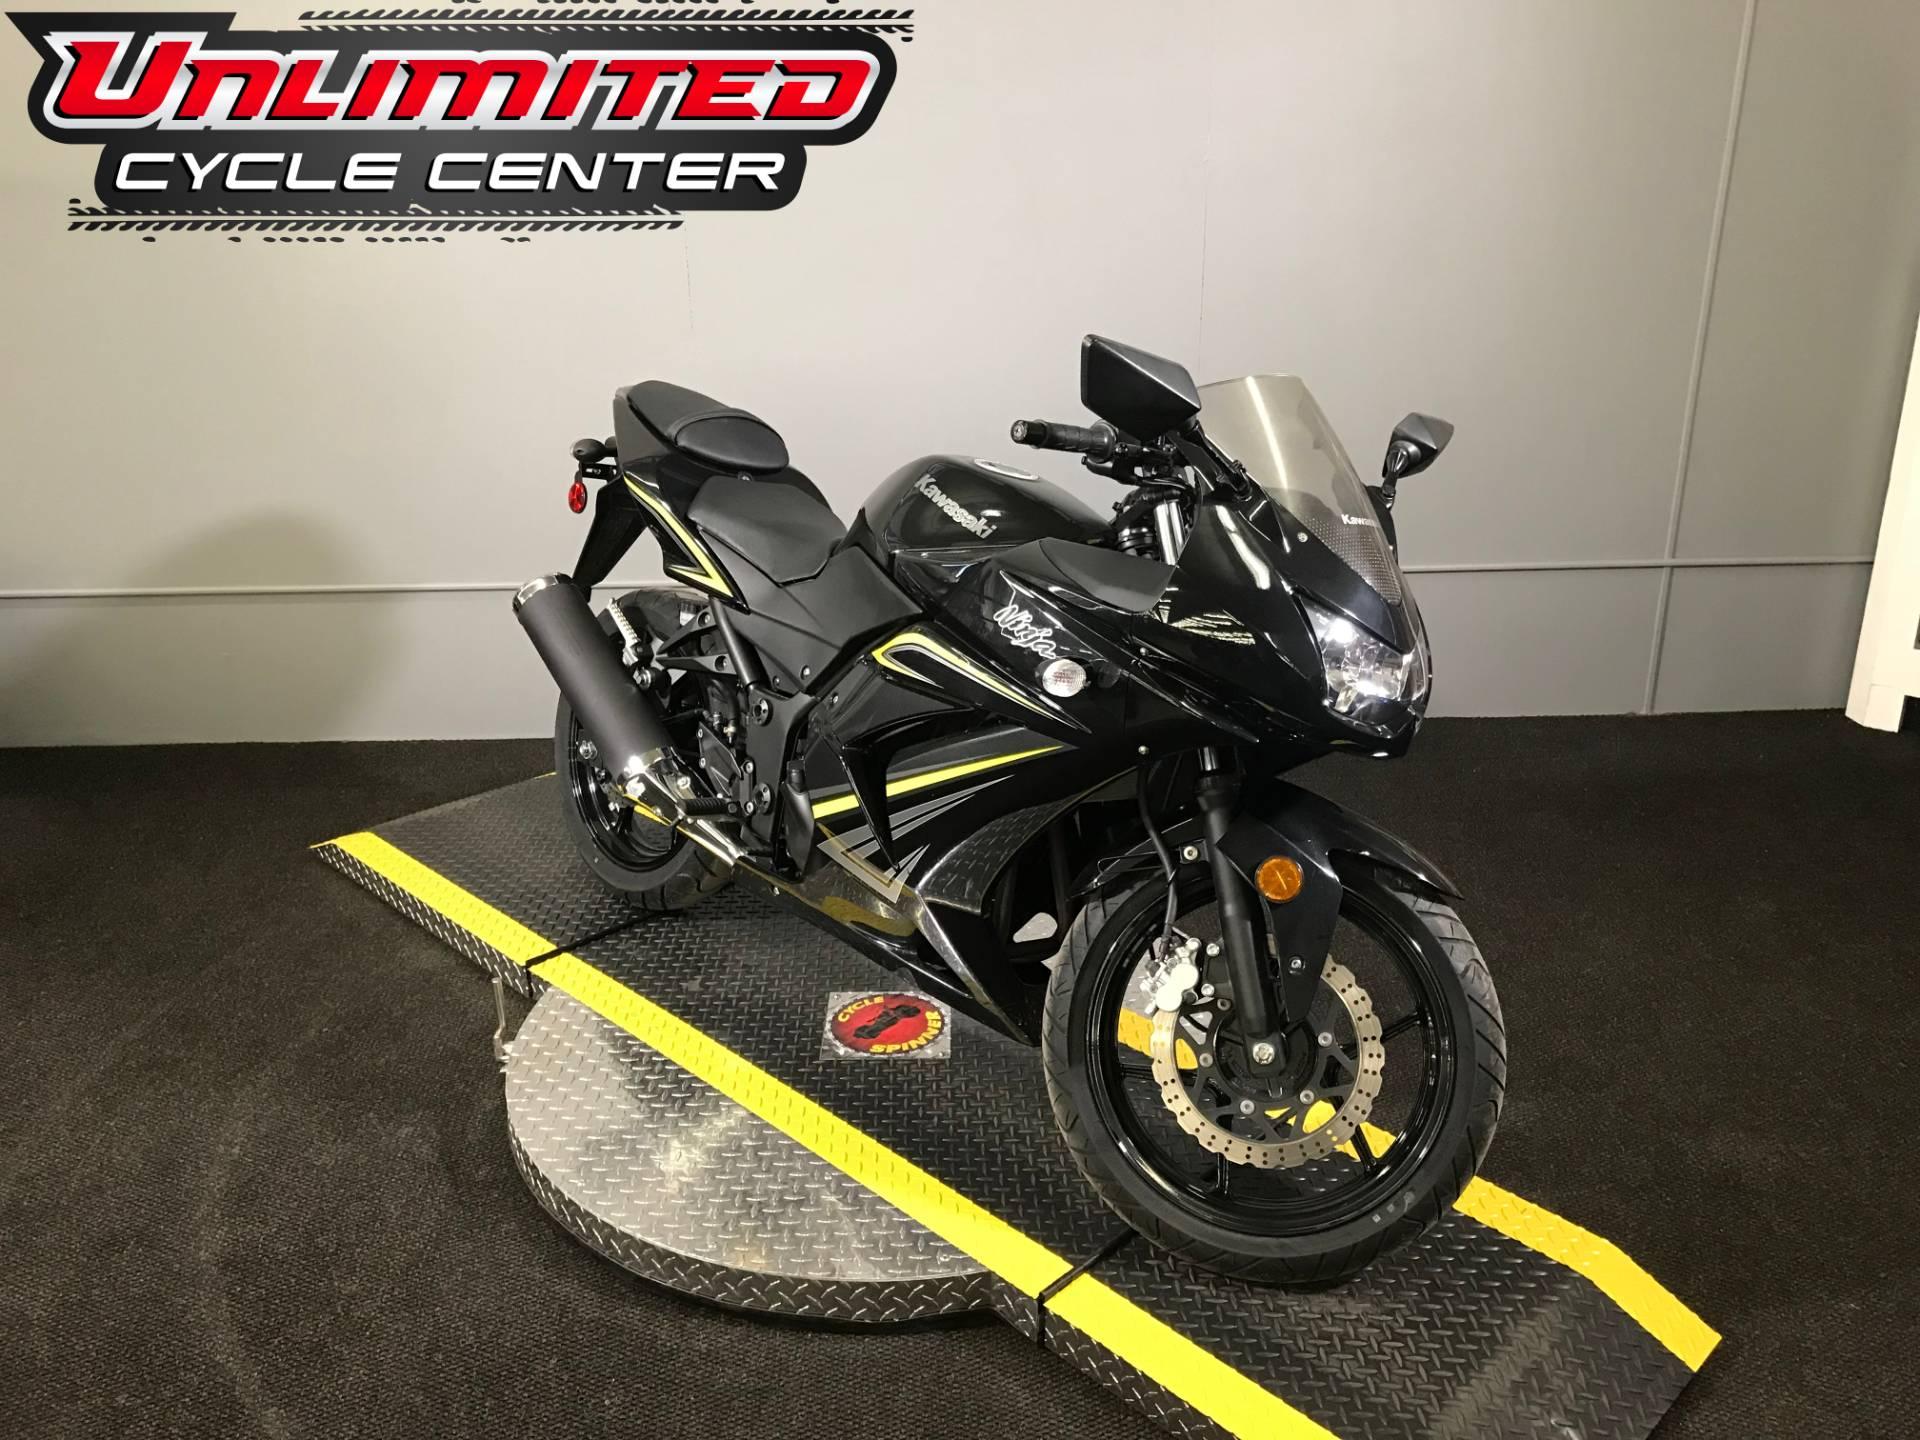 2012 Kawasaki Ninja 250r Motorcycles Tyrone Pennsylvania